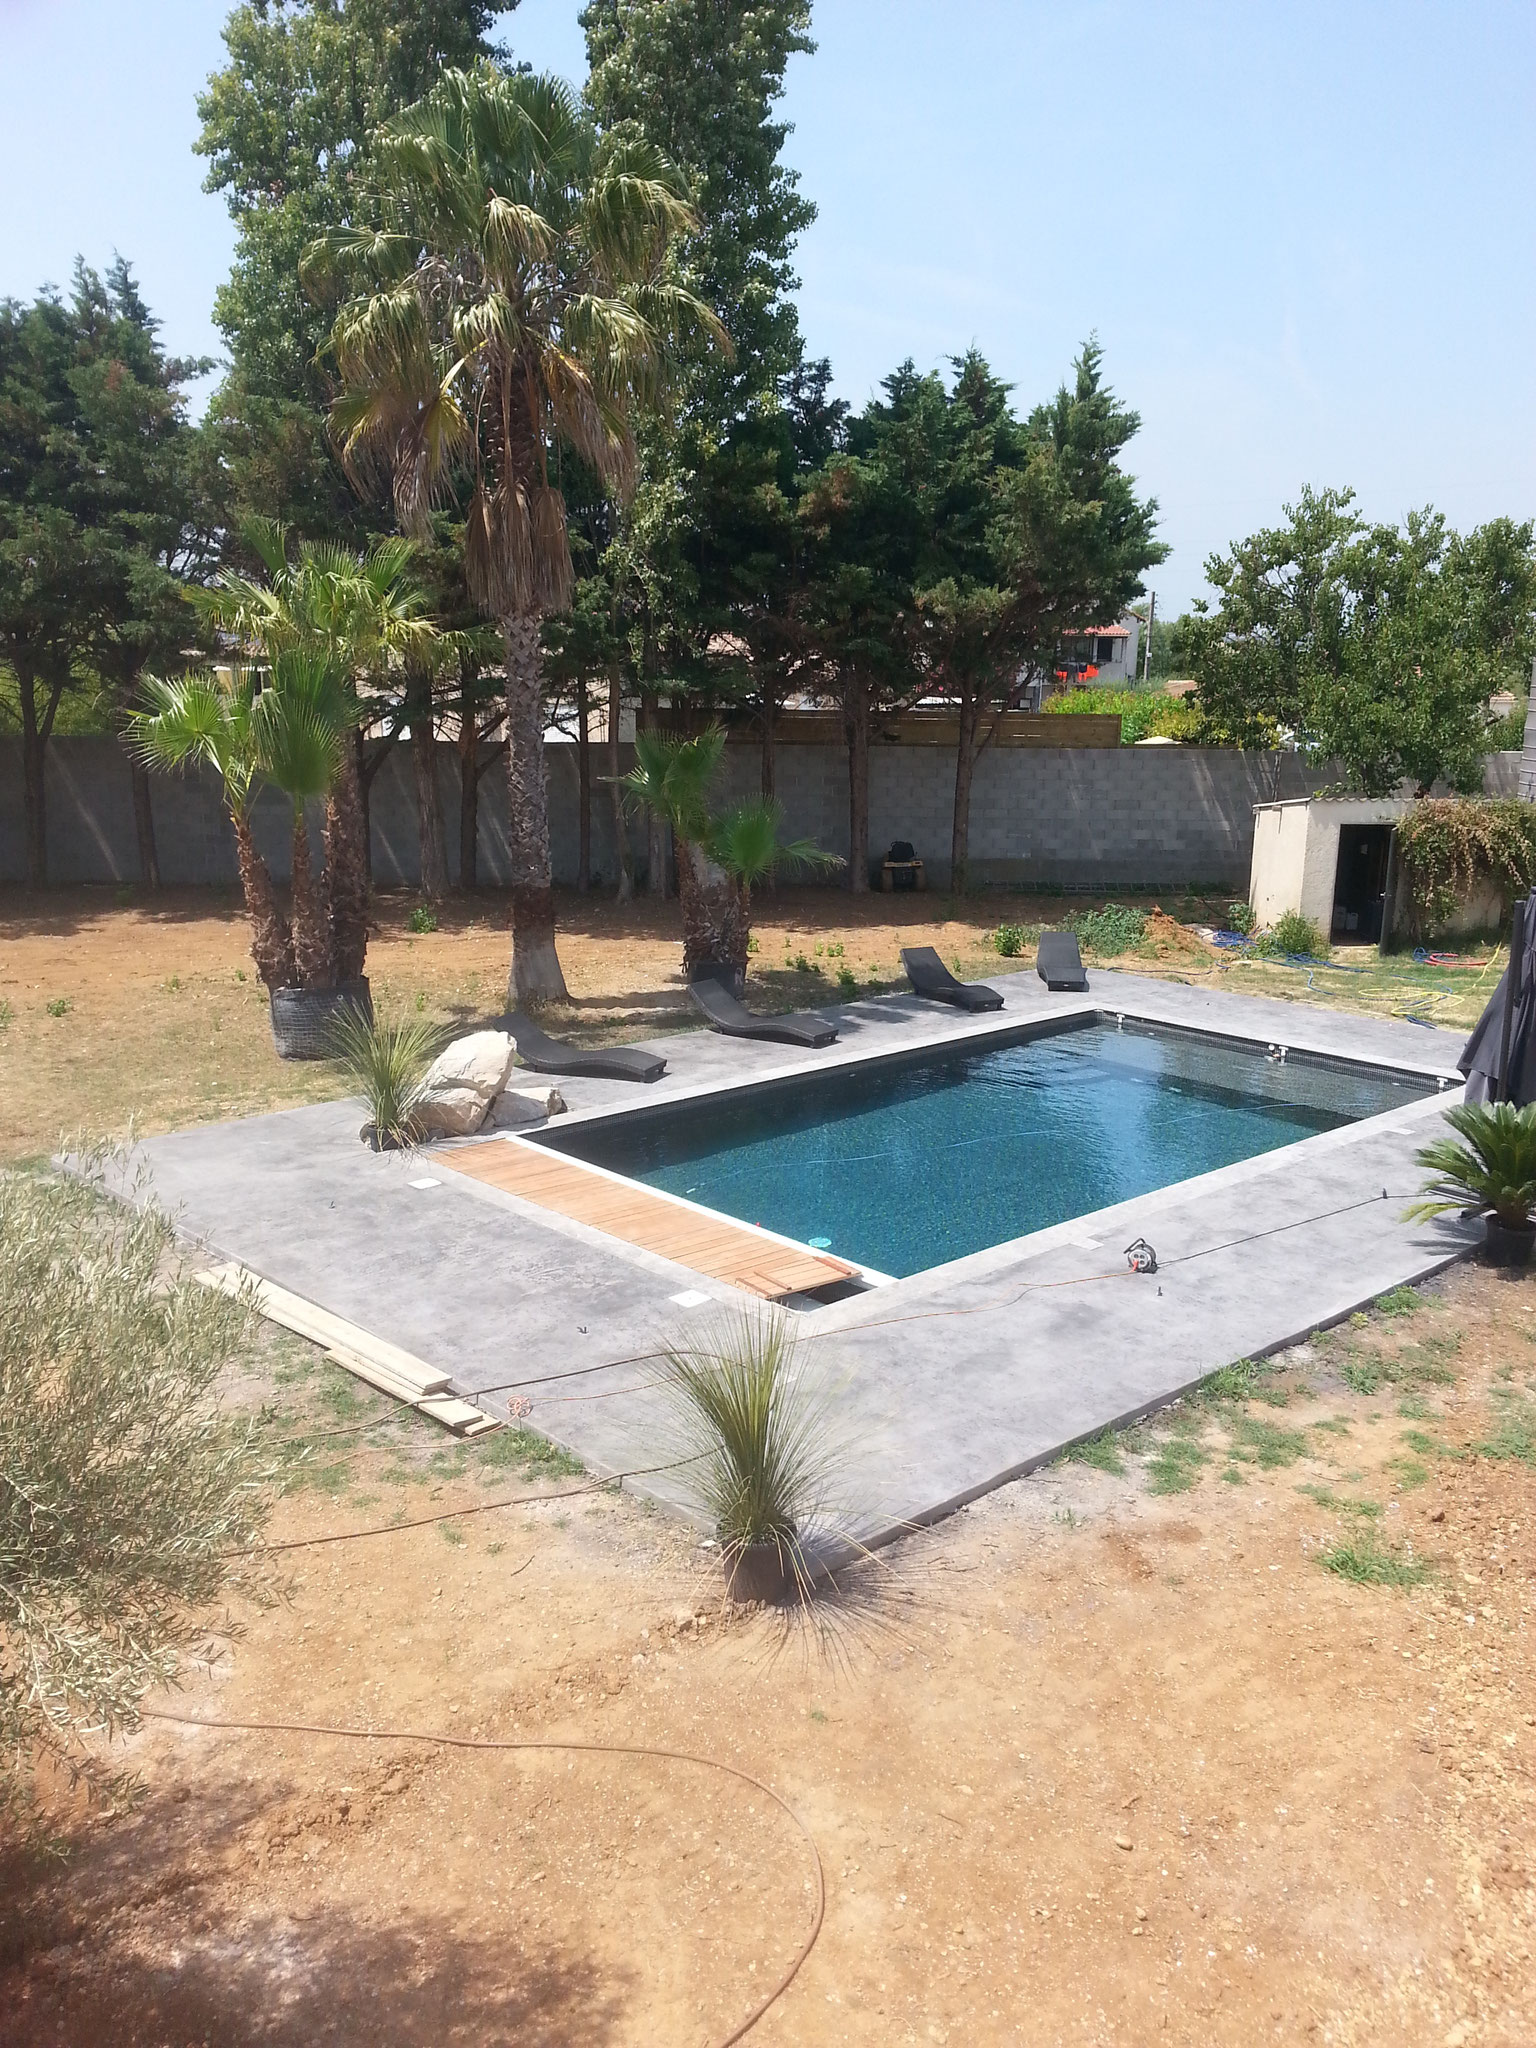 Constructeur De Piscine Montpellier piscine kachou 06 60 97 89 14 . - piscine kachou